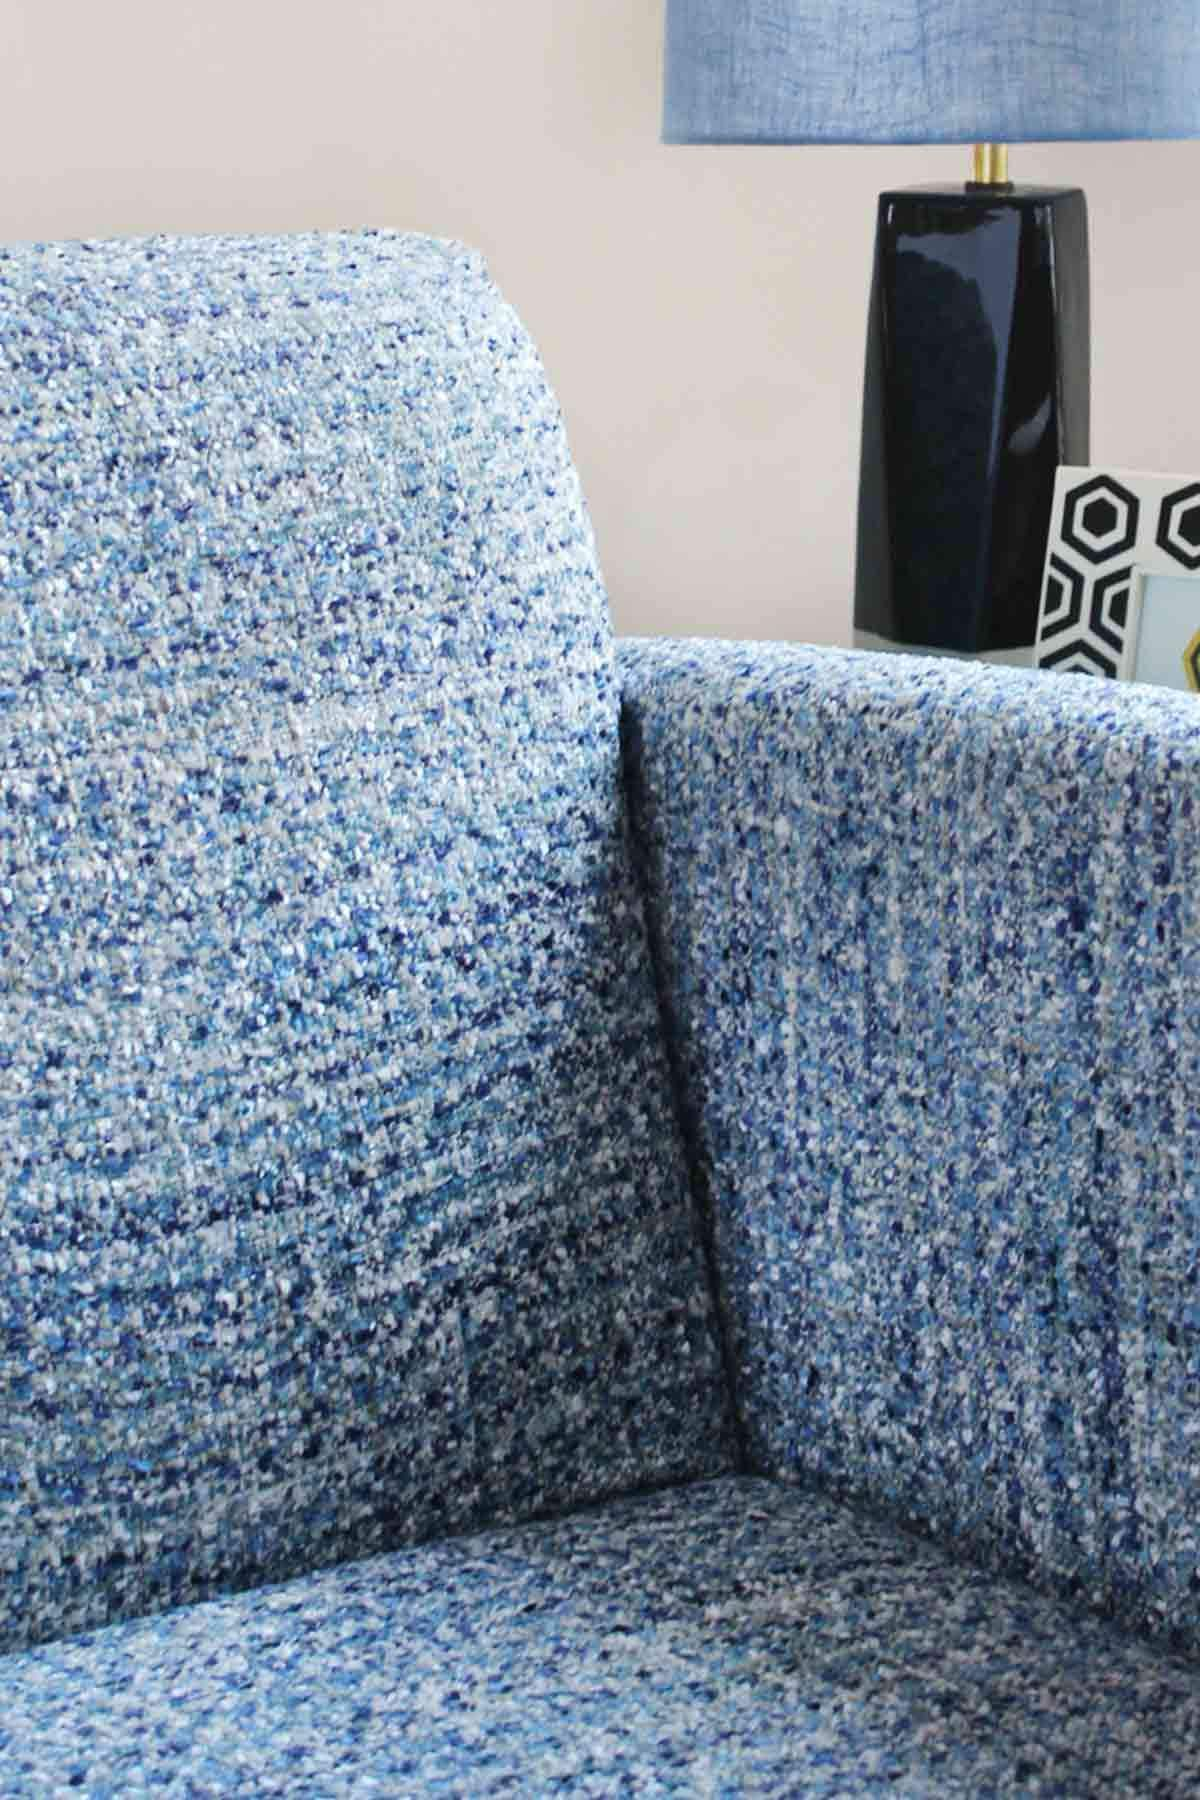 Freedom Tree Blue Water Tweed Blue Upholstery Fabric Upholstery Fabric Upholstery Fabric Projects Upholstery Fabric Samples Upholstery Fabric